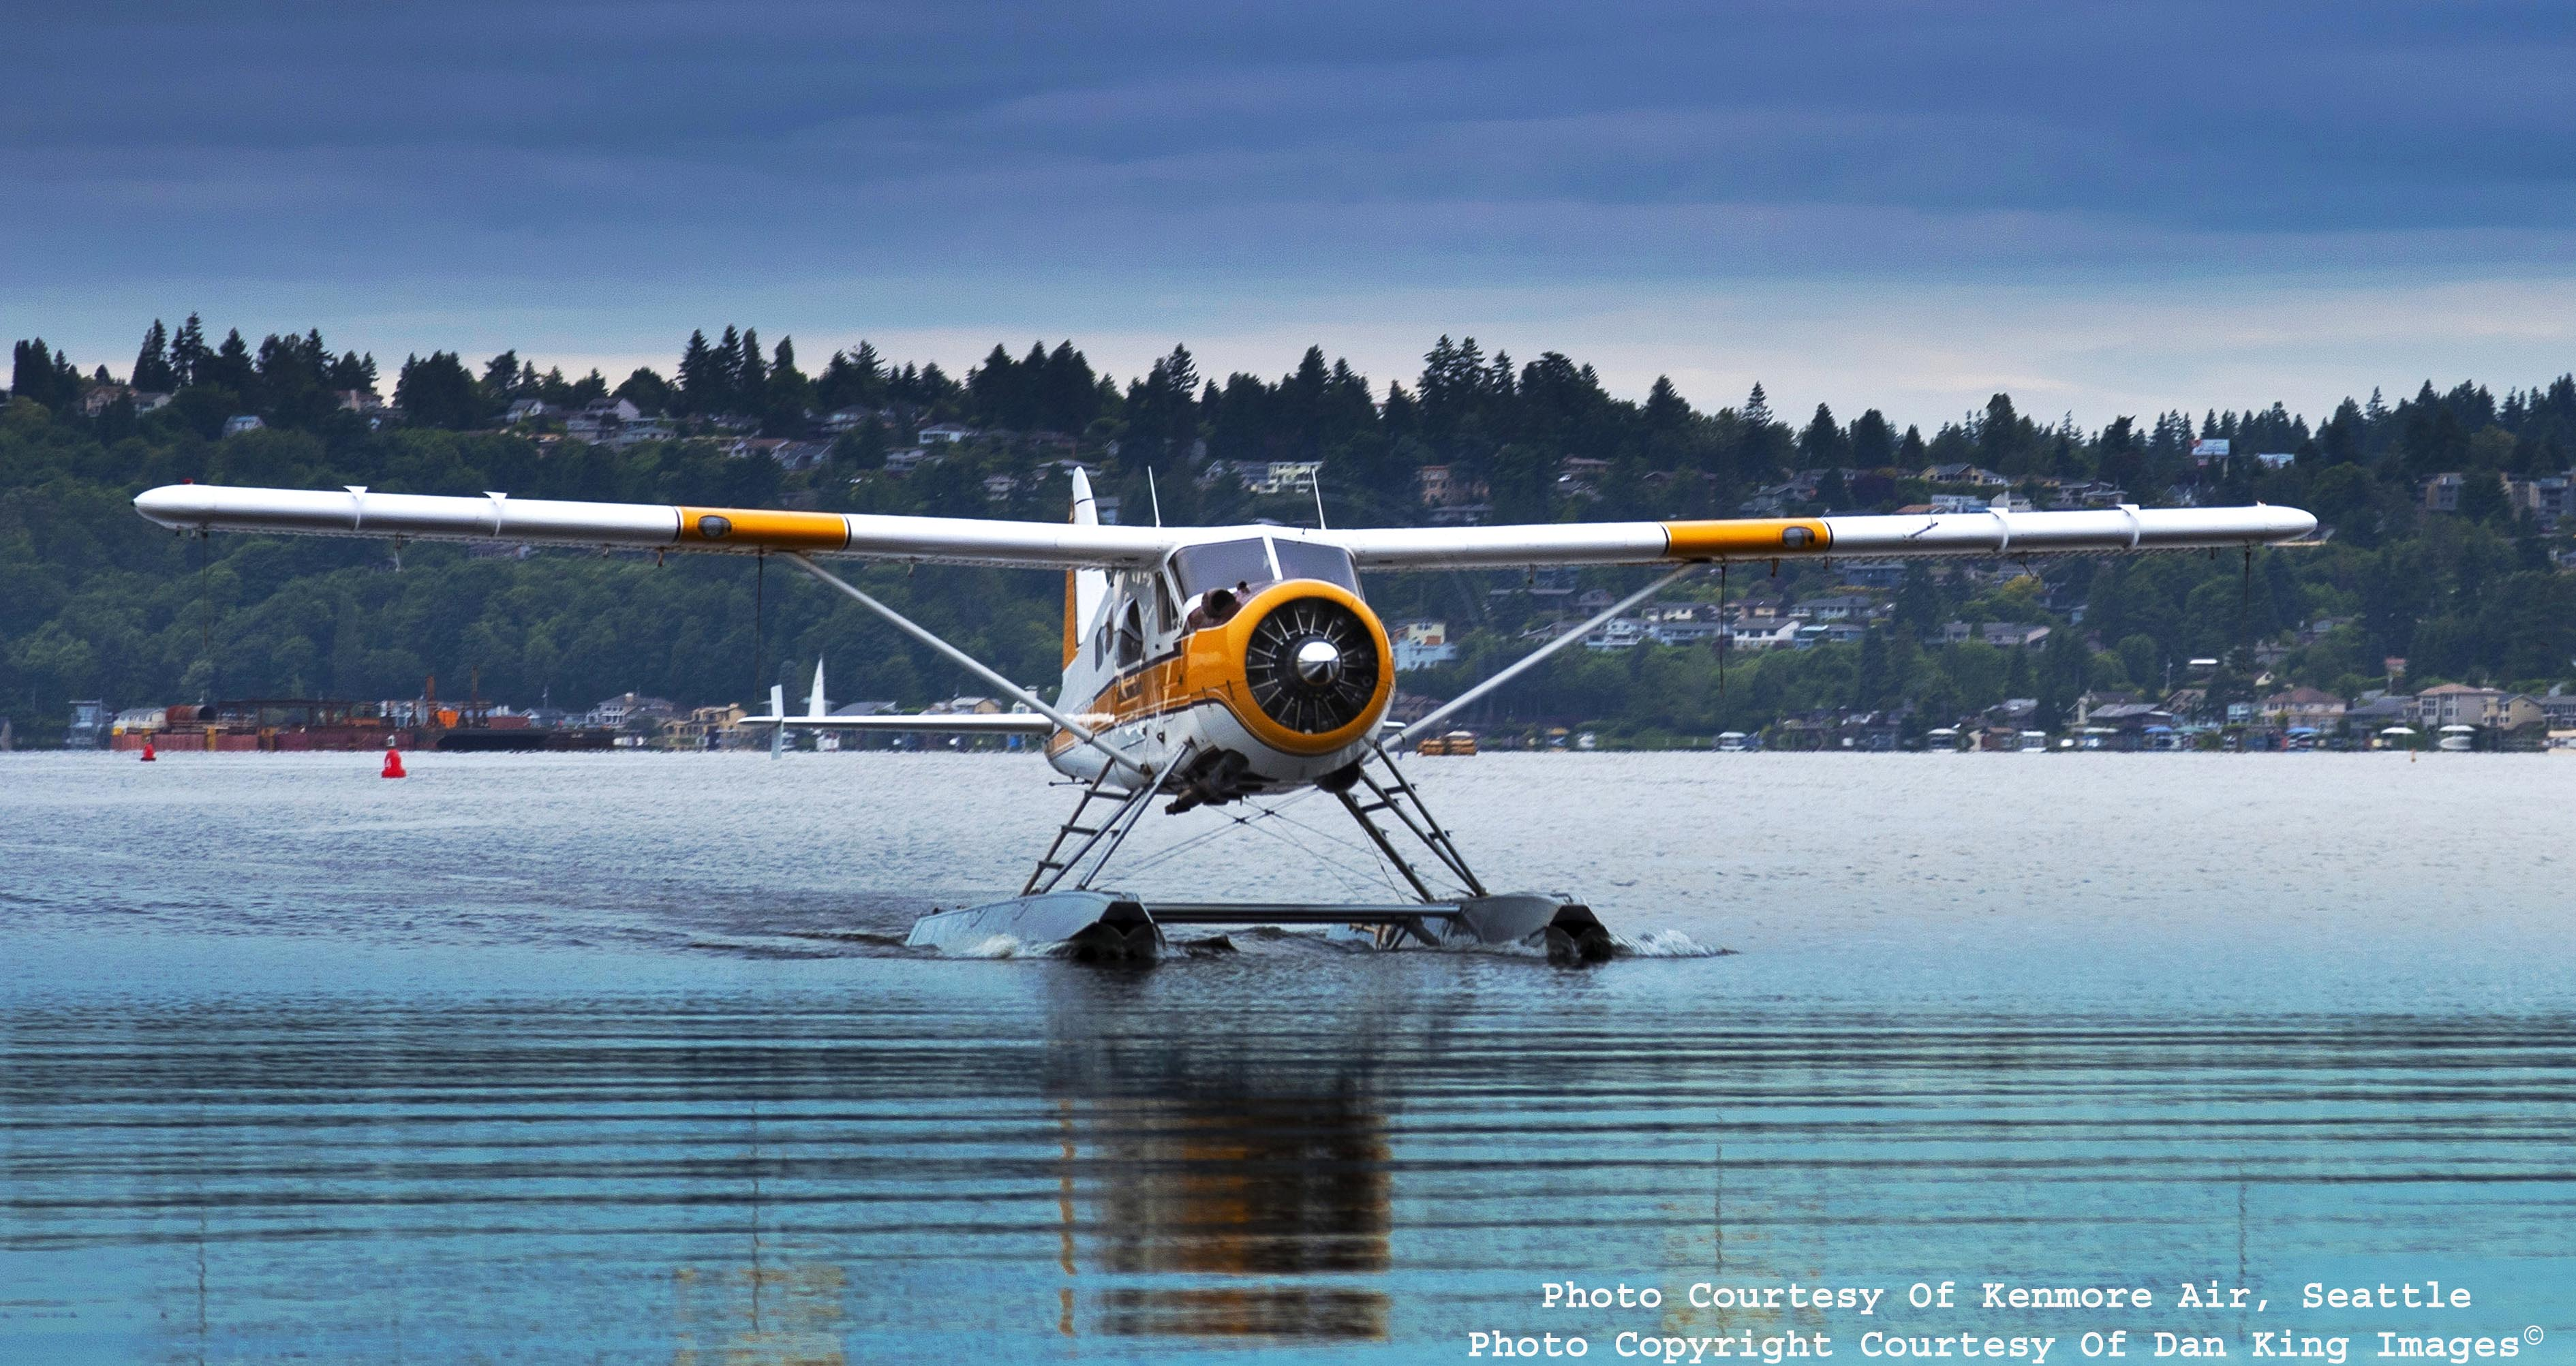 Kenmore Air Seattle image b